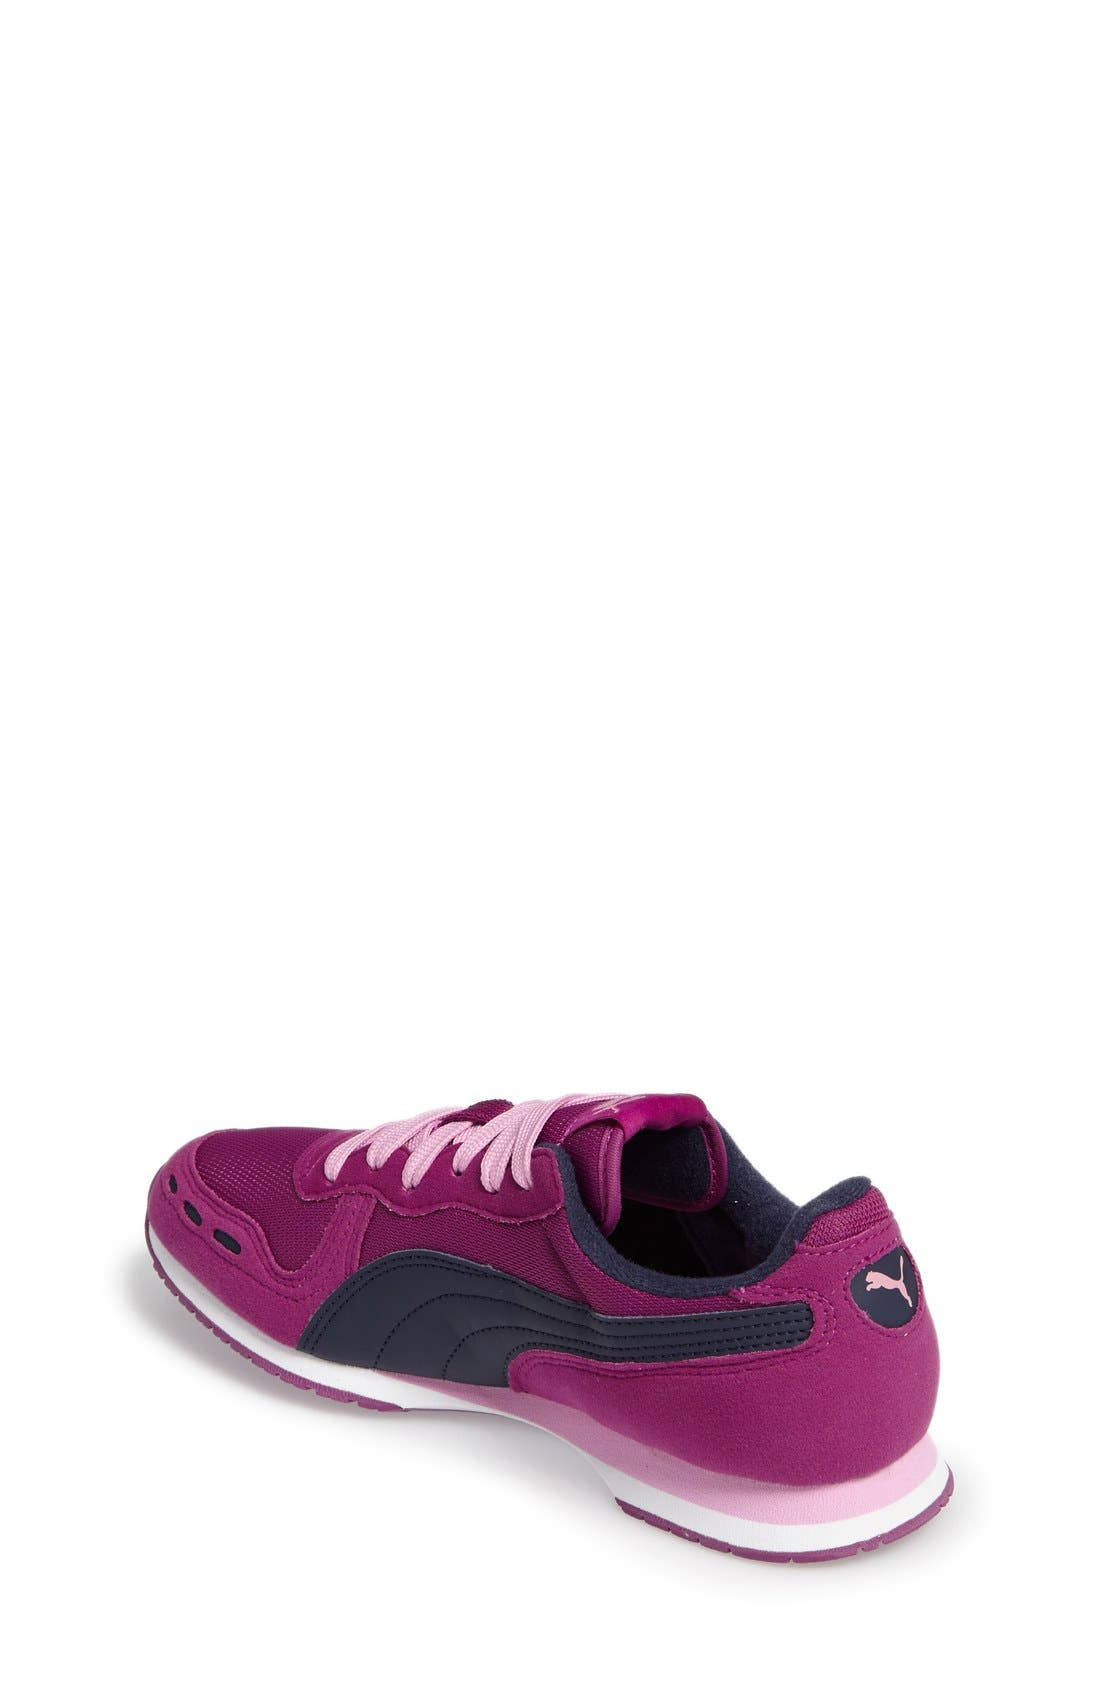 Alternate Image 2  - PUMA Cabana Racer Sneaker (Big Kid)